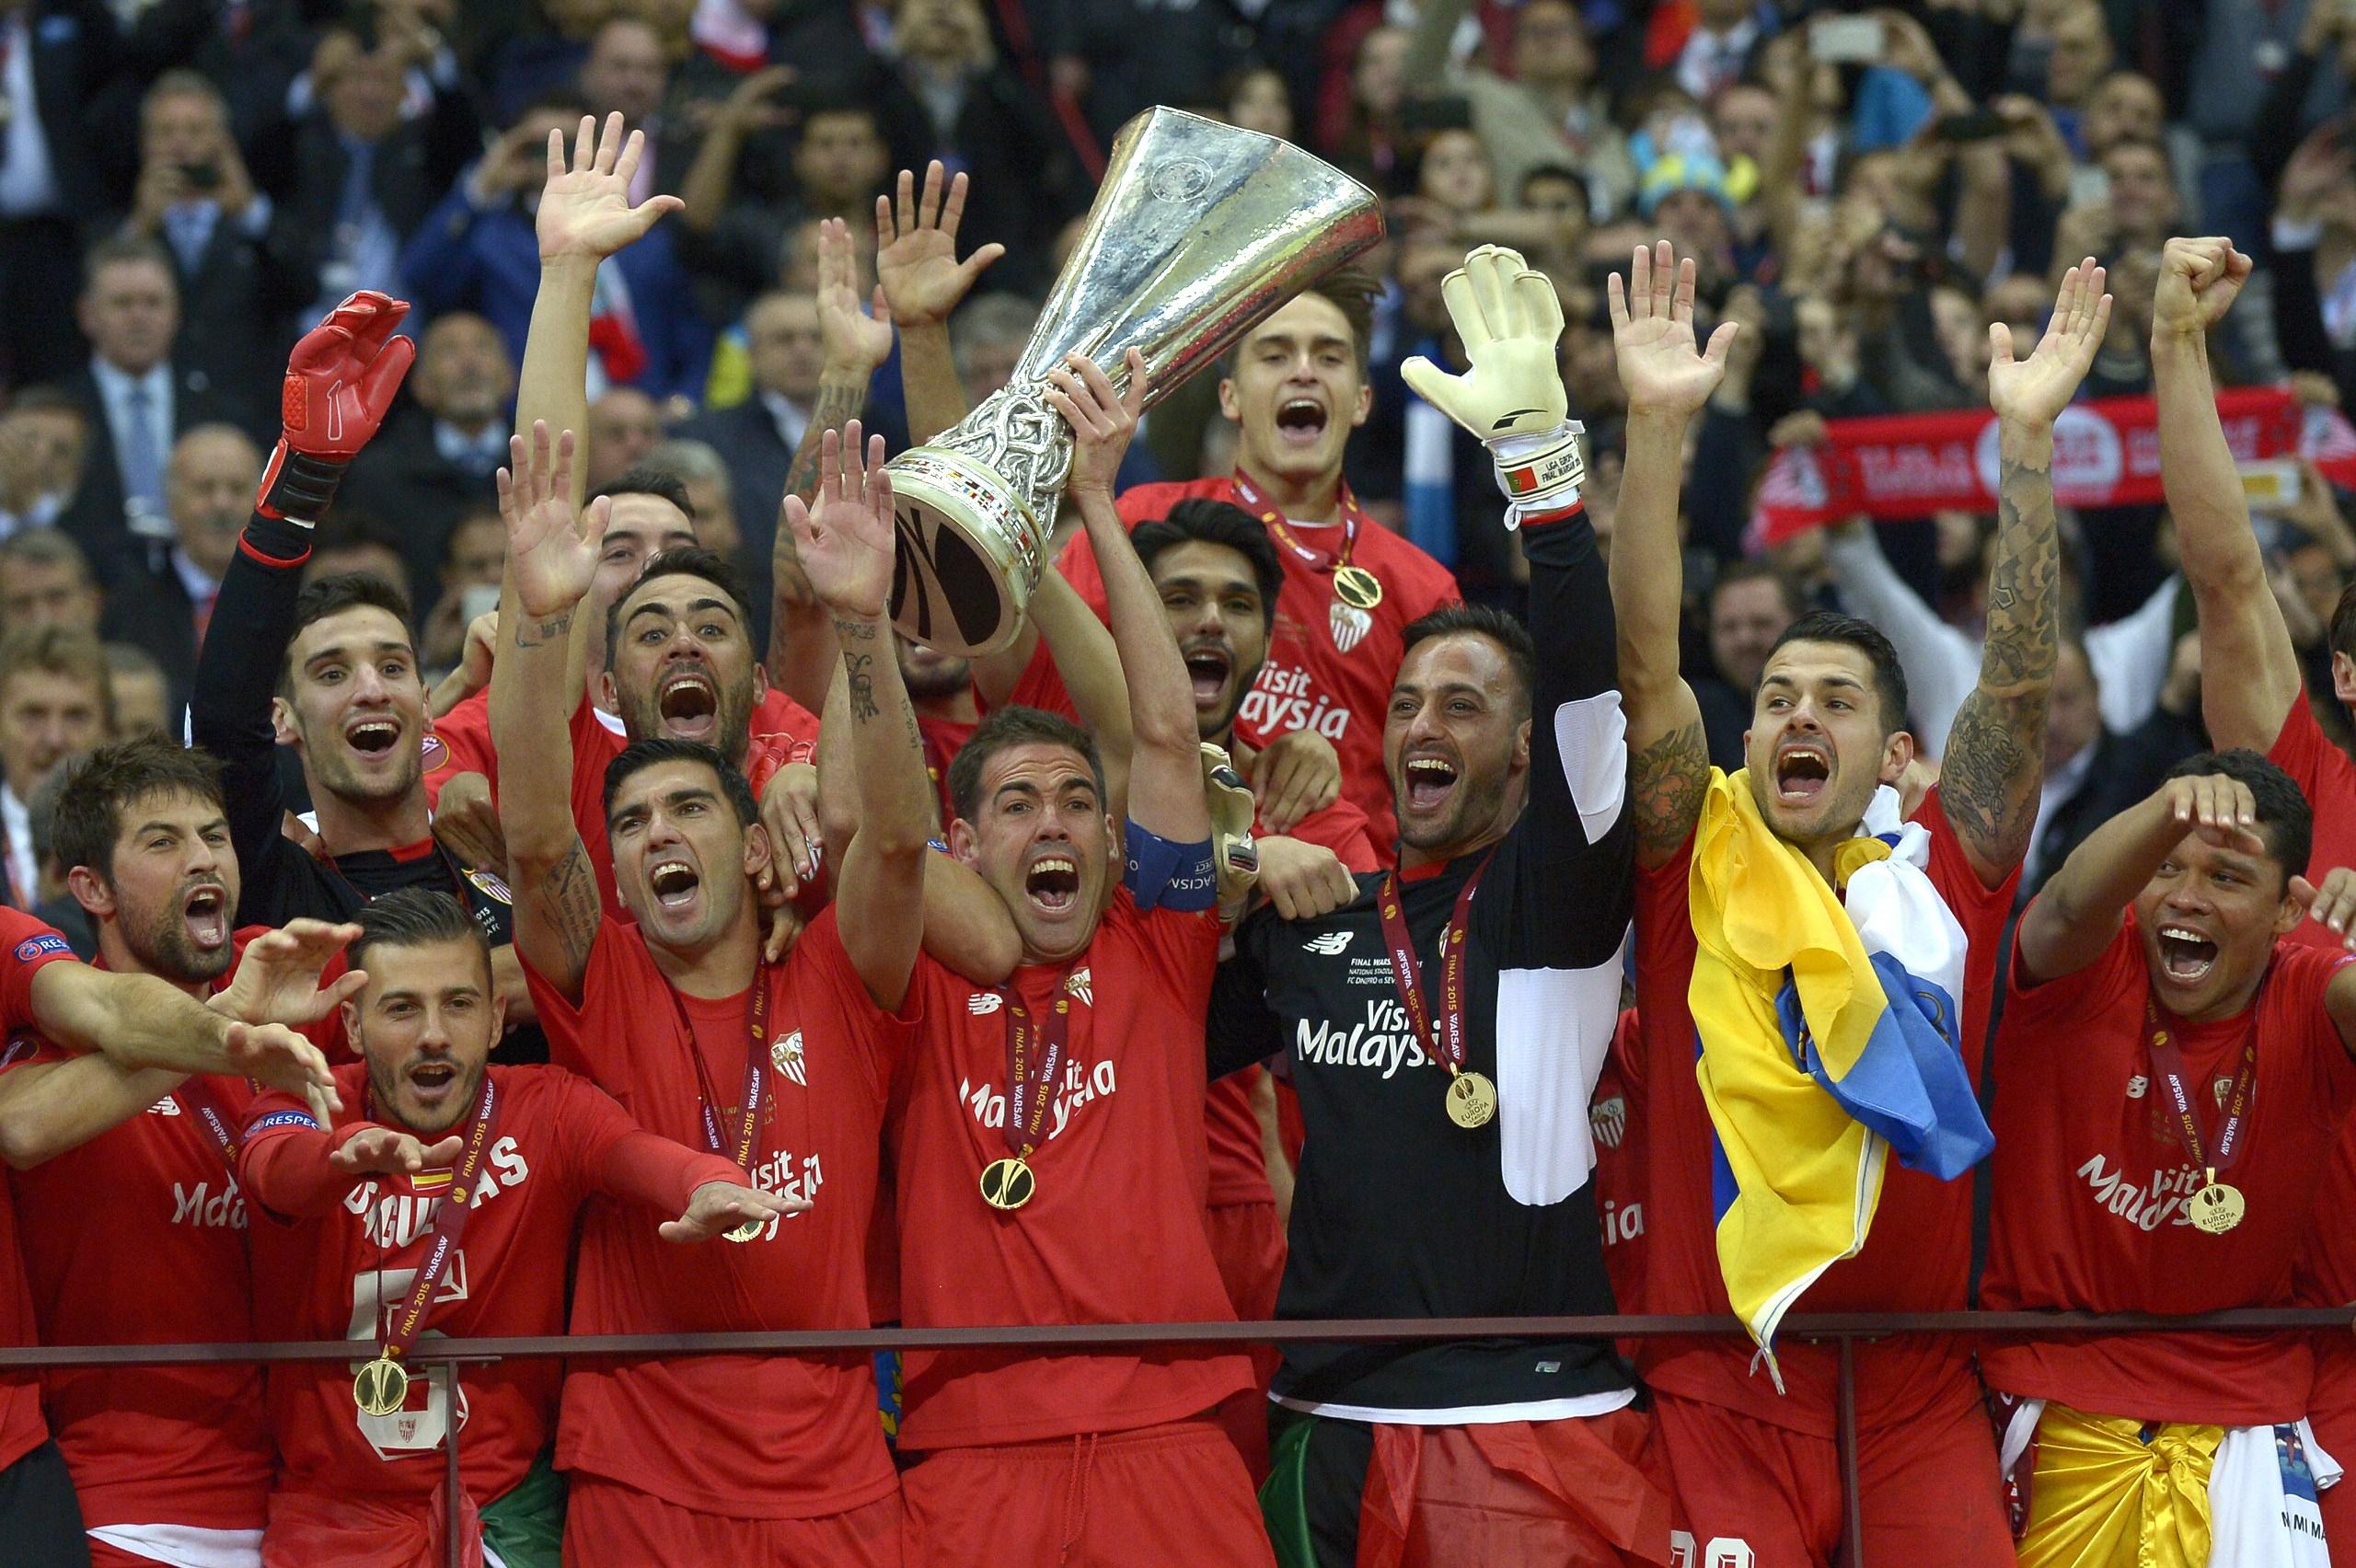 Sevilla Europa League Champions 2015